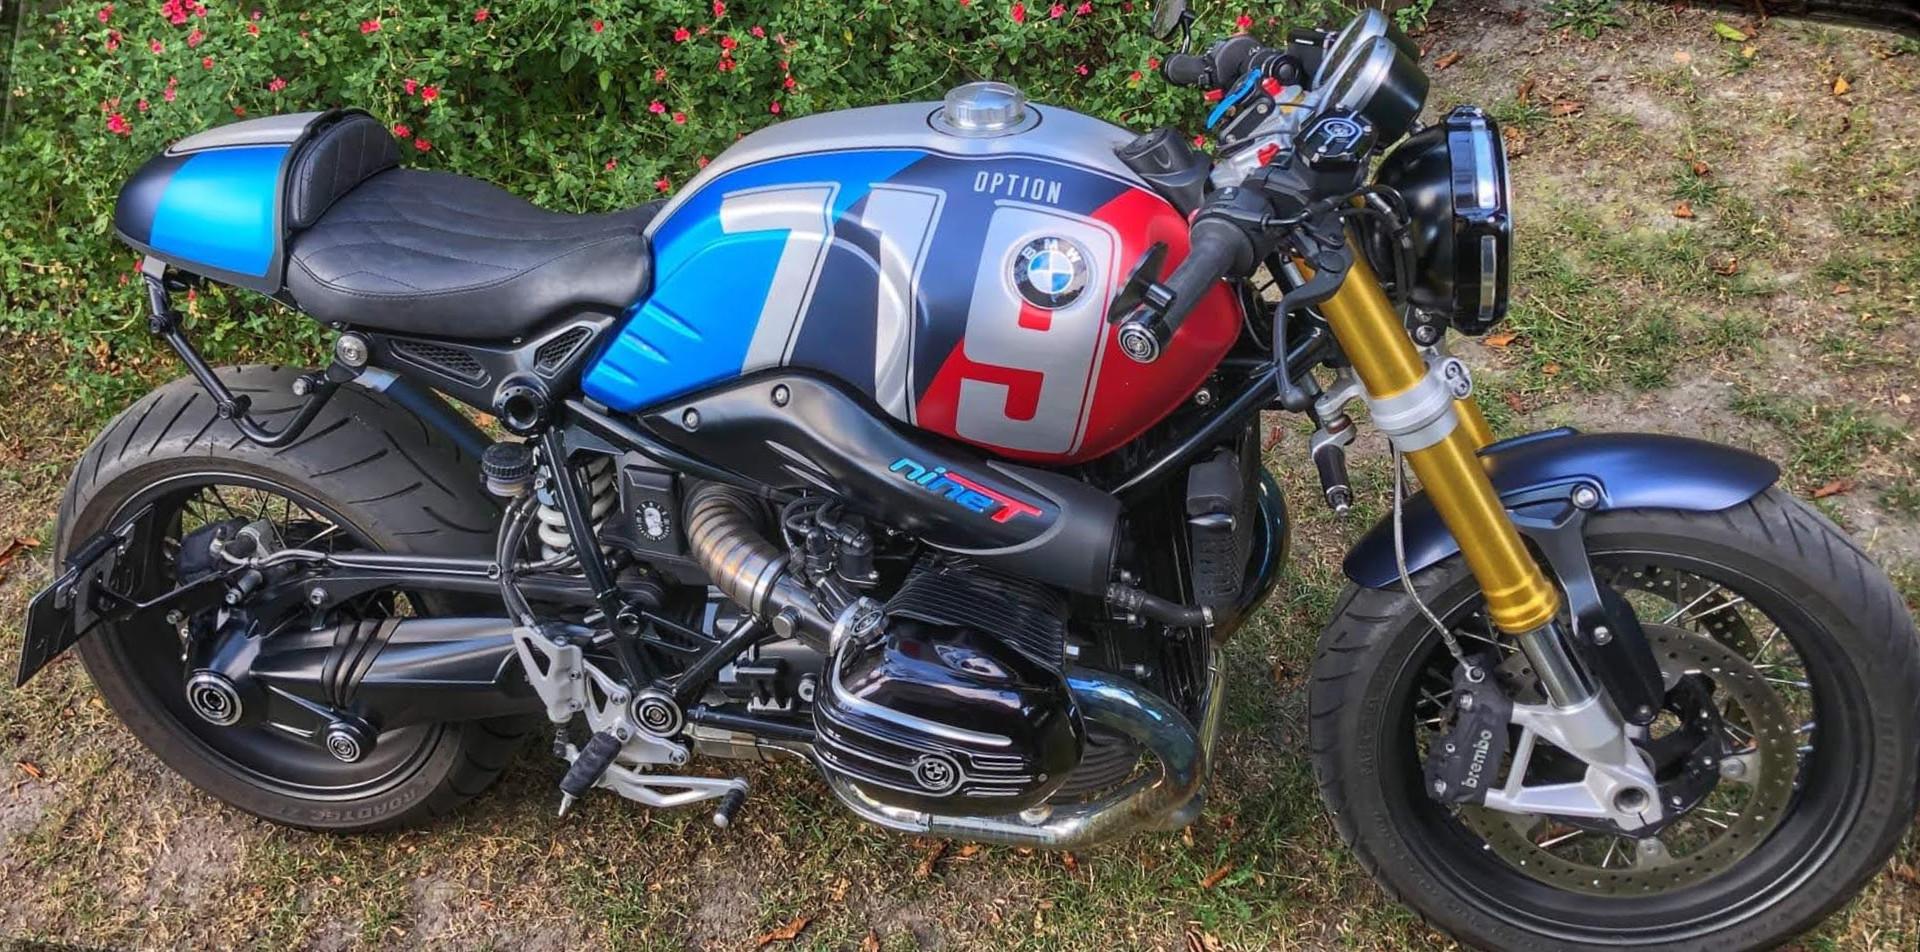 BMW R Nine-T Option 719